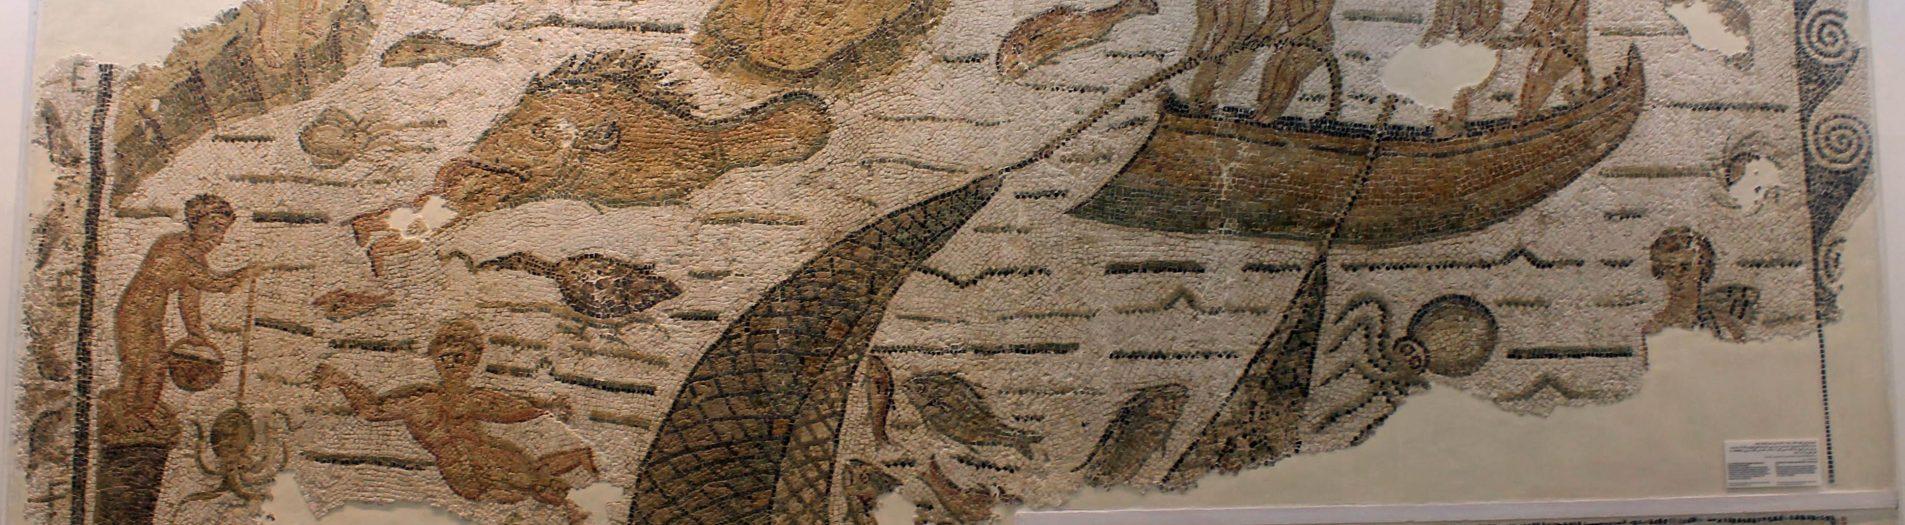 La mosaïque de Fundus Bassianus